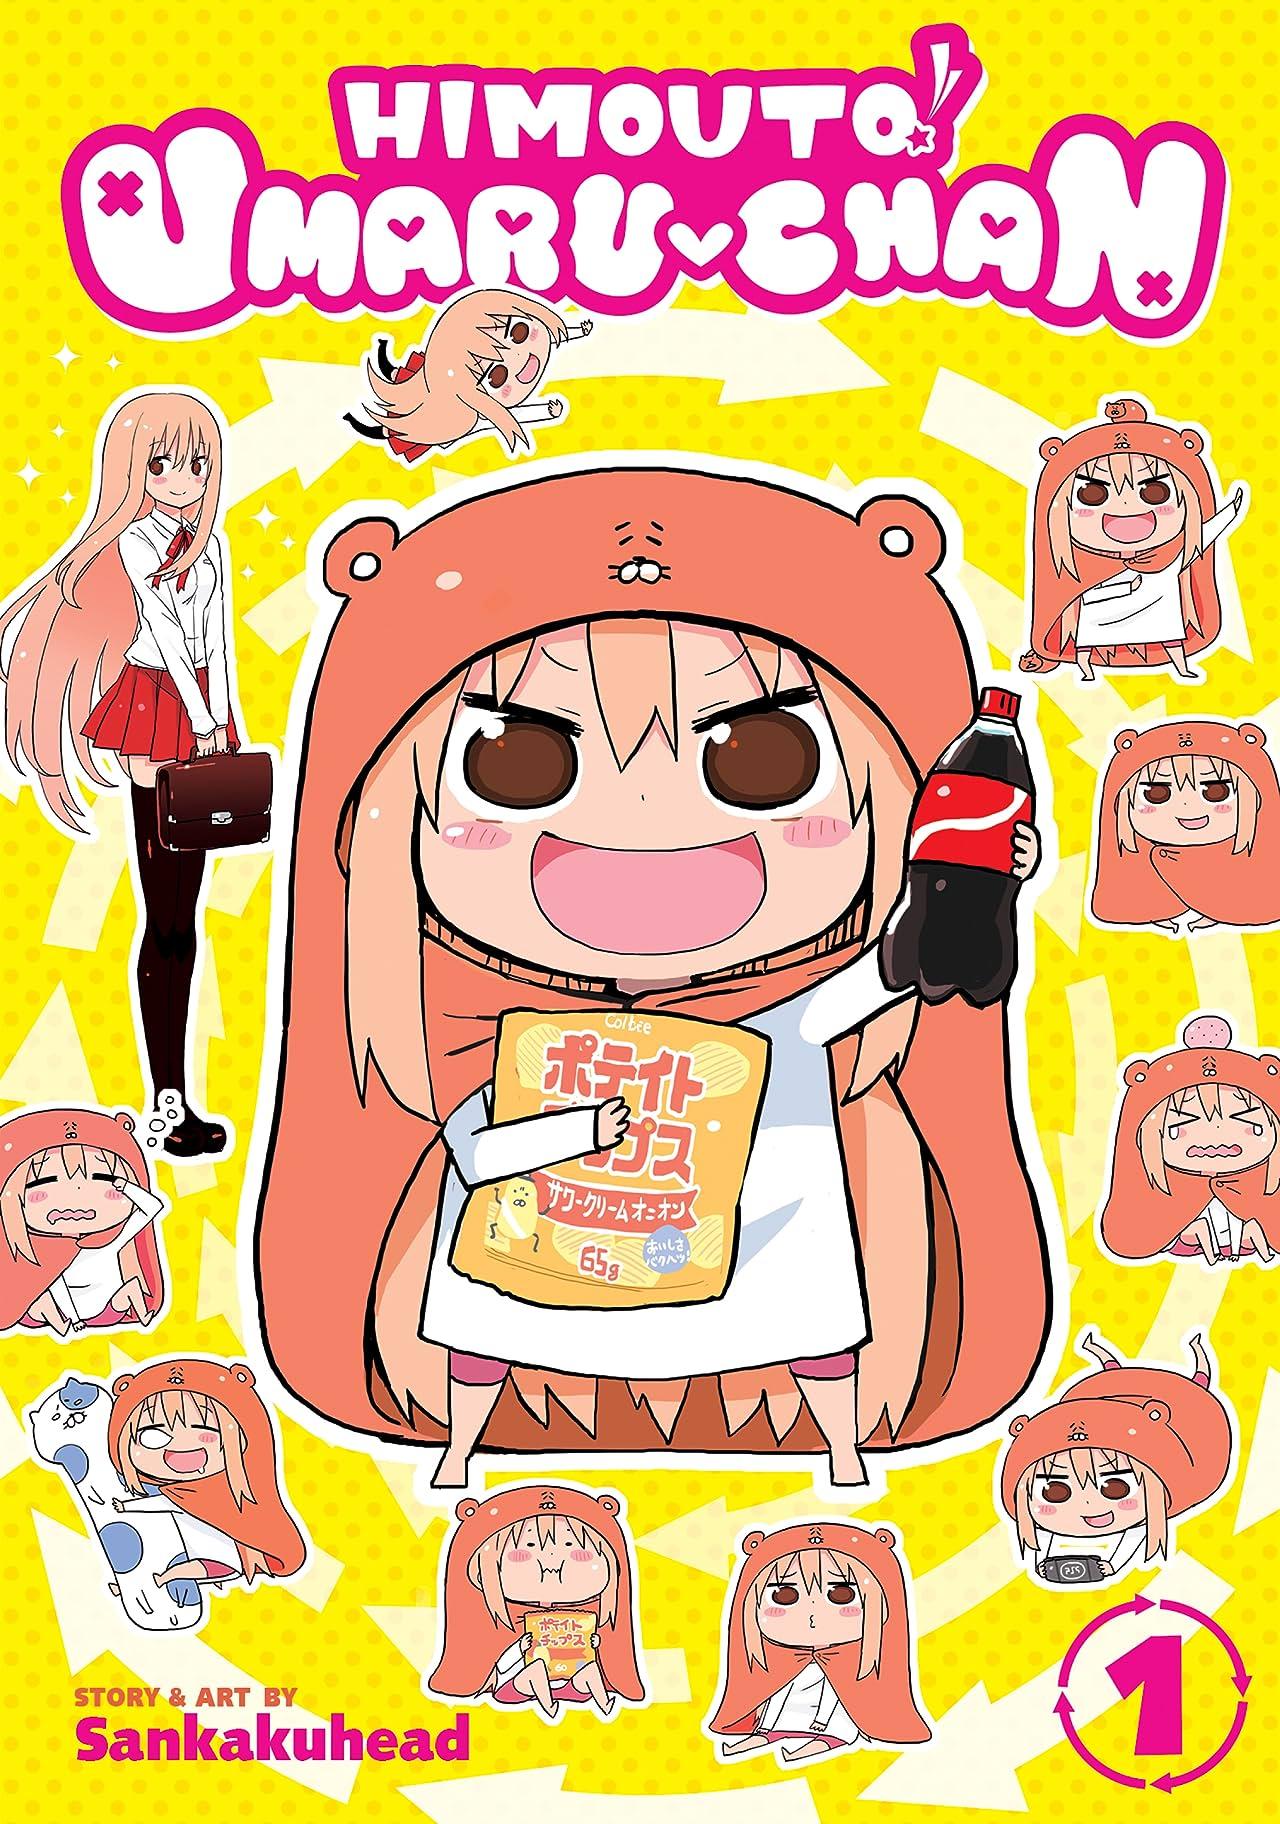 Himouto! Umaru-chan Vol. 1